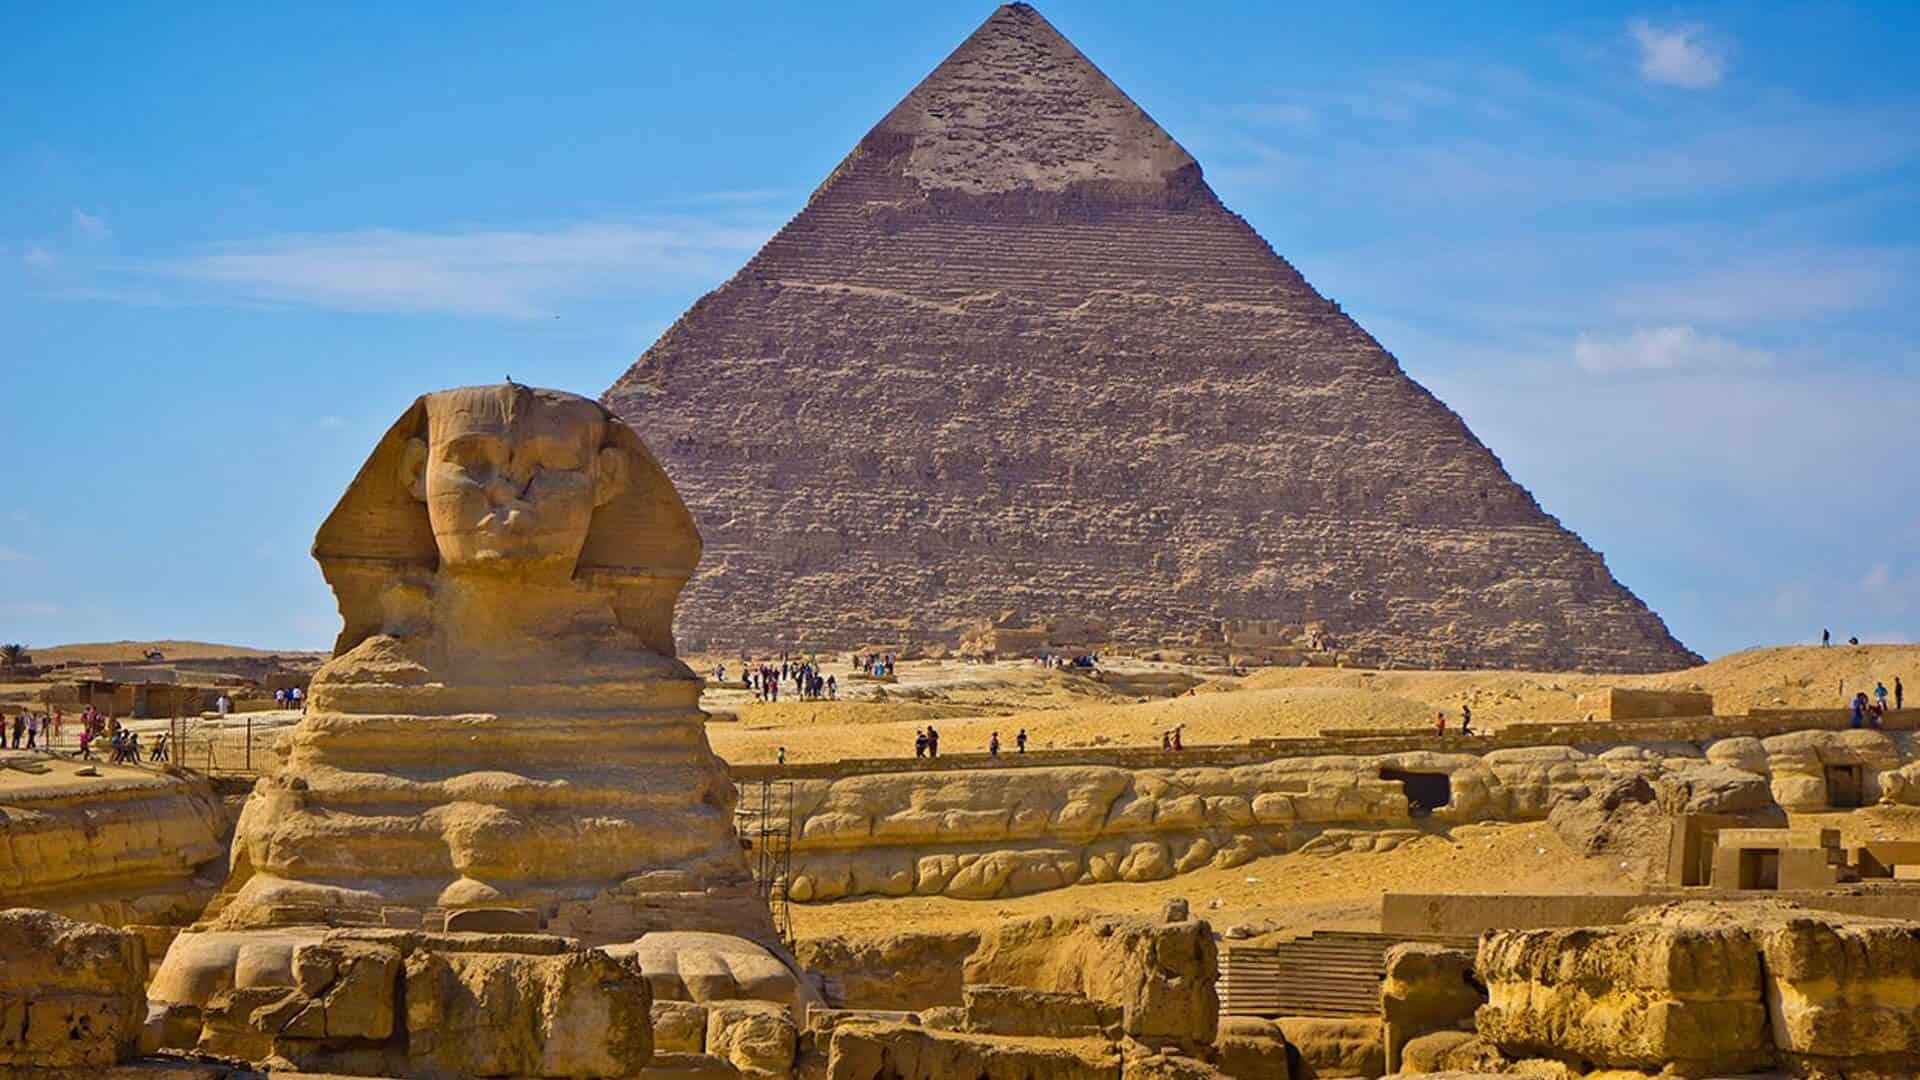 Pyramids & Sphinx, Egypt